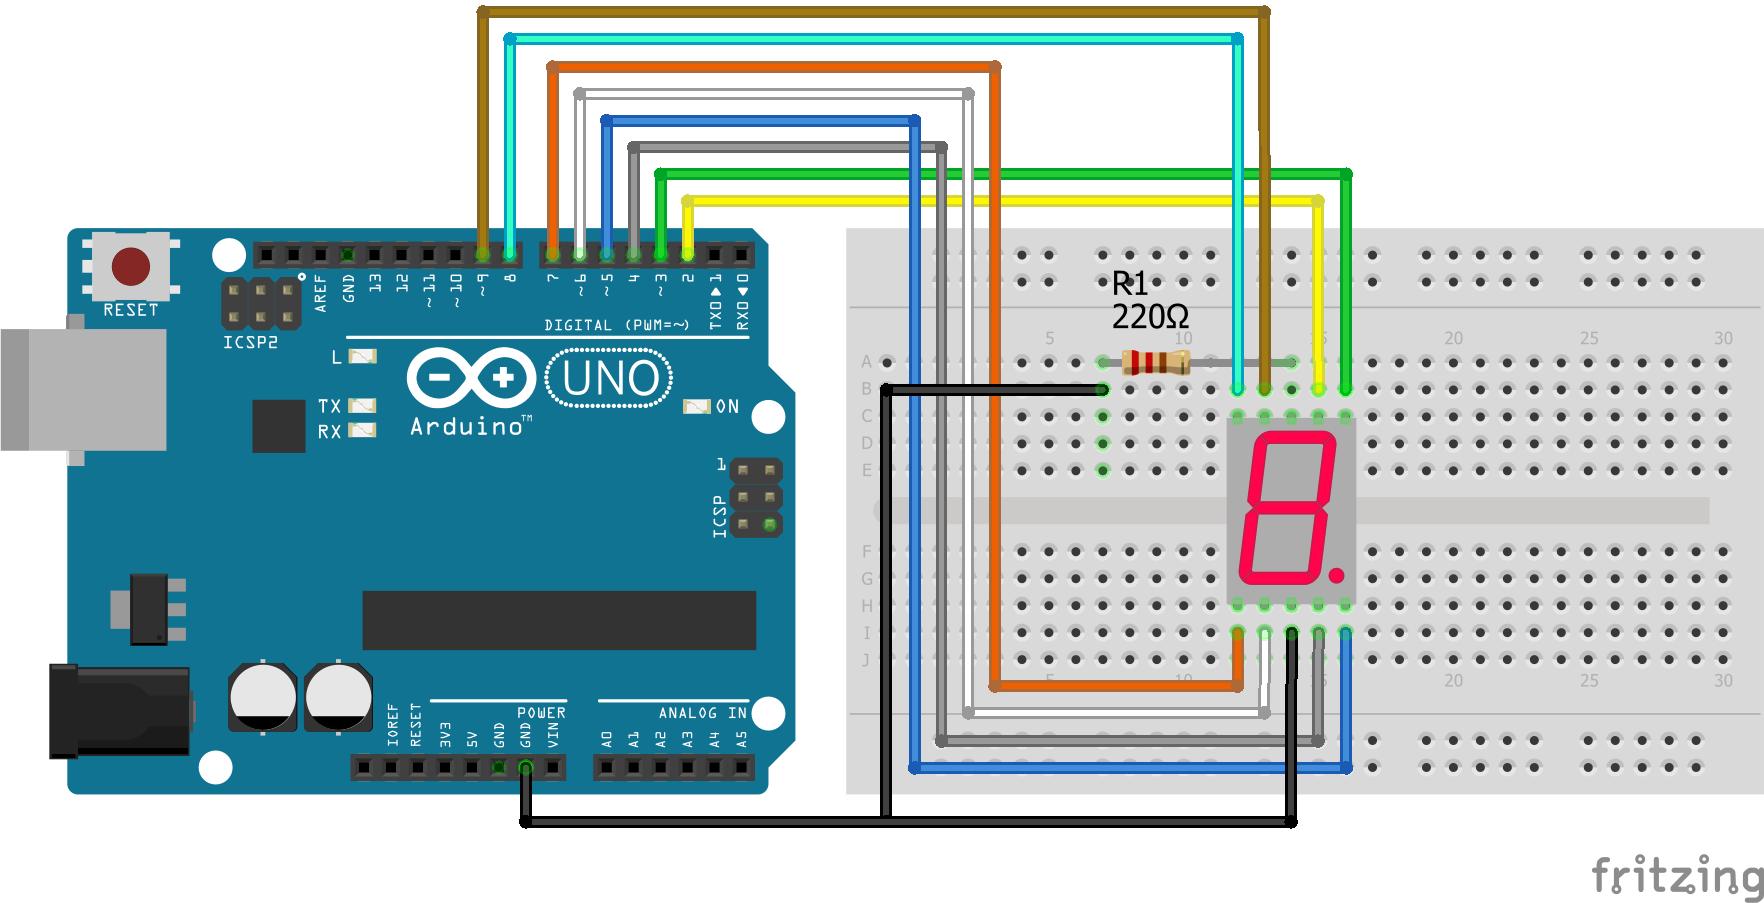 7 Segment LED Display Arduino Uno